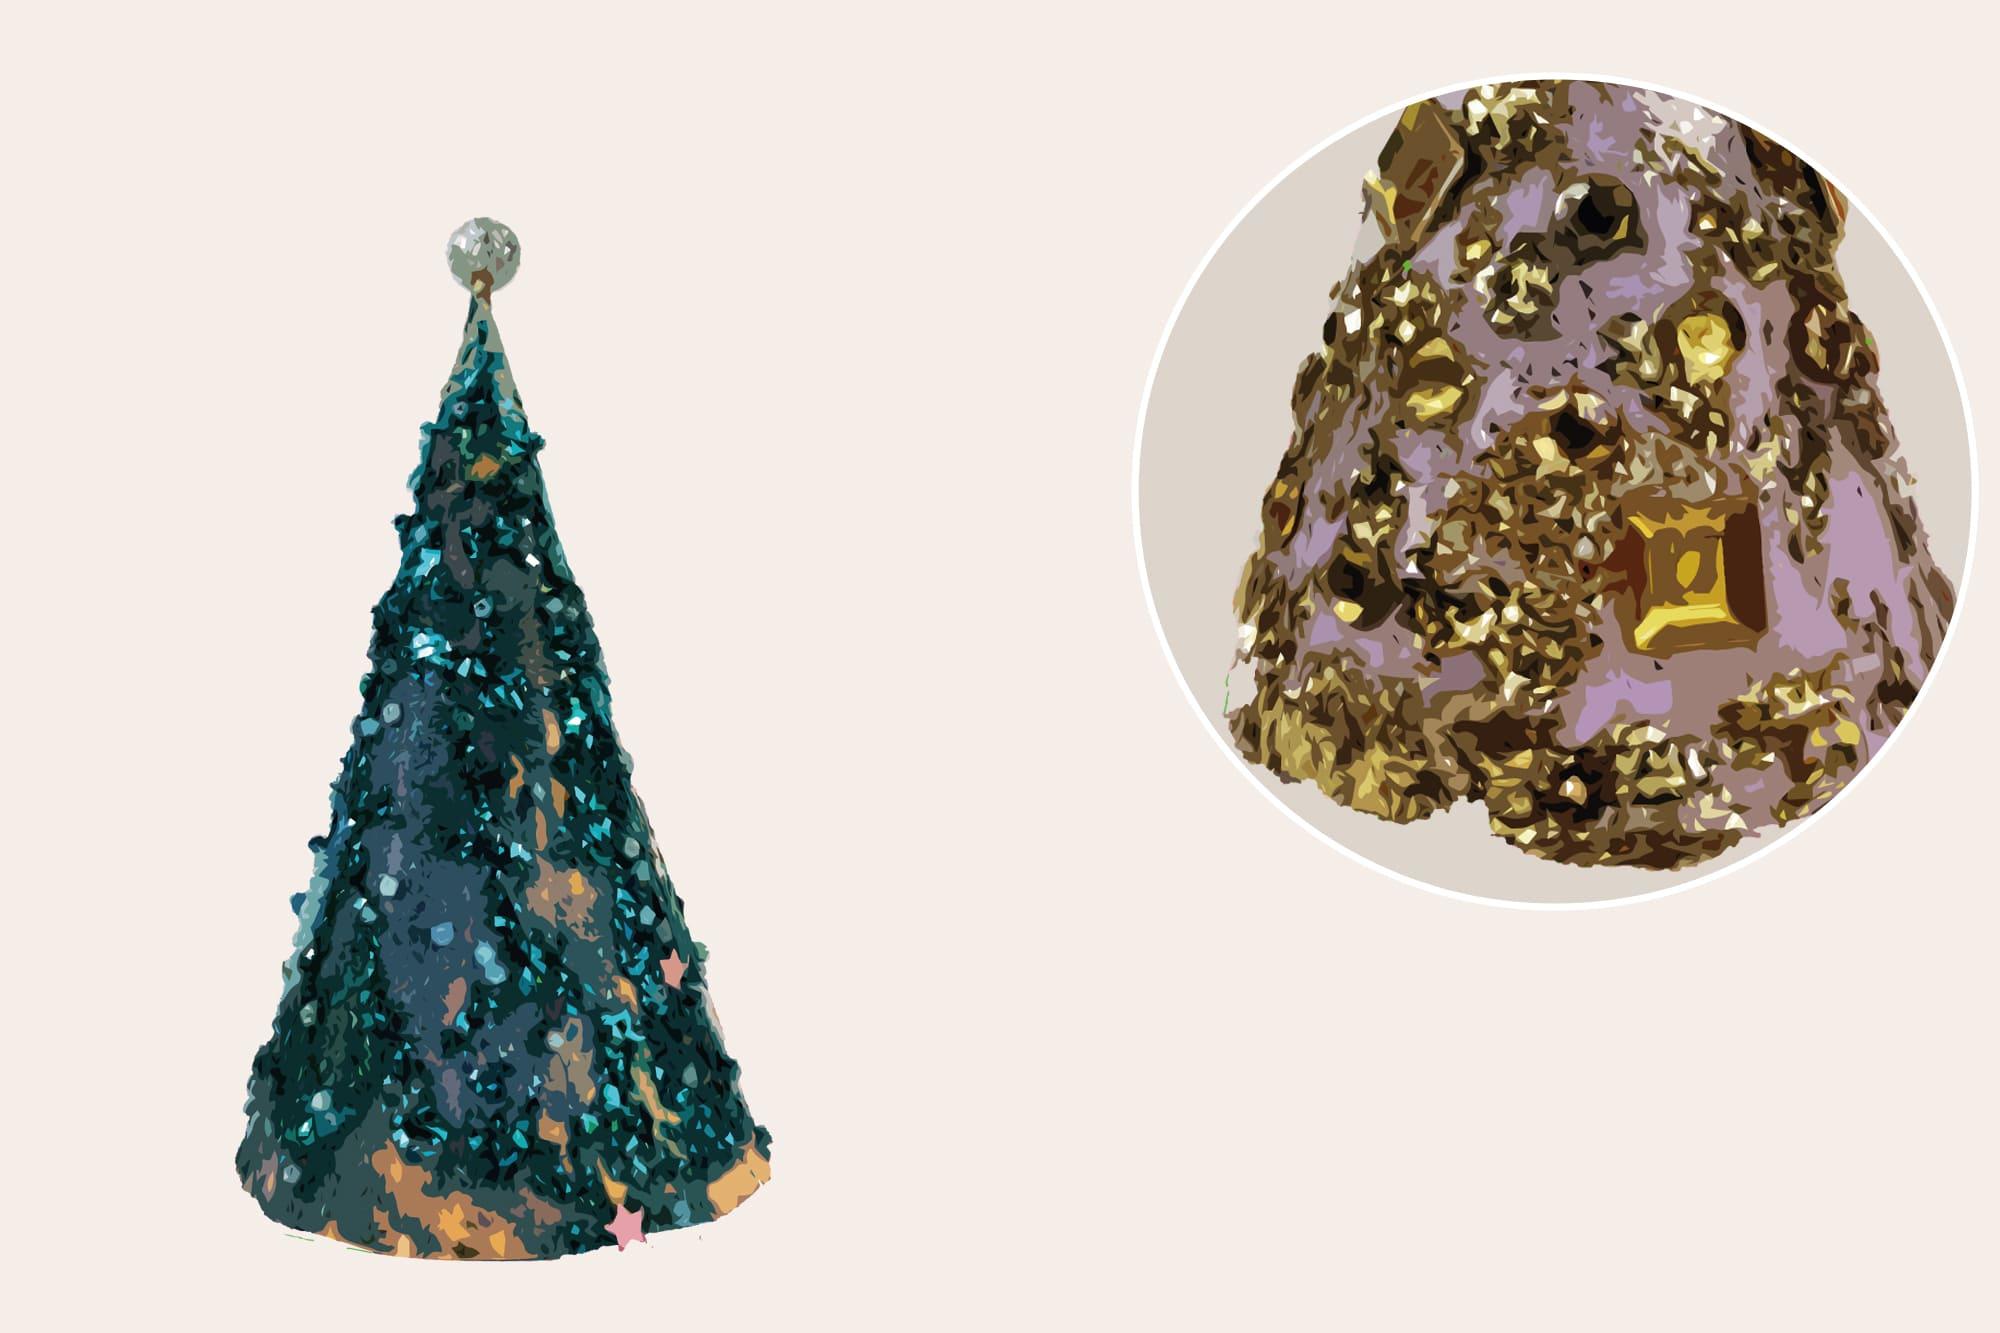 496 Christmas Illustrations: Christmas Vectors Bundle SVG, EPS, AI - Xmas trees b